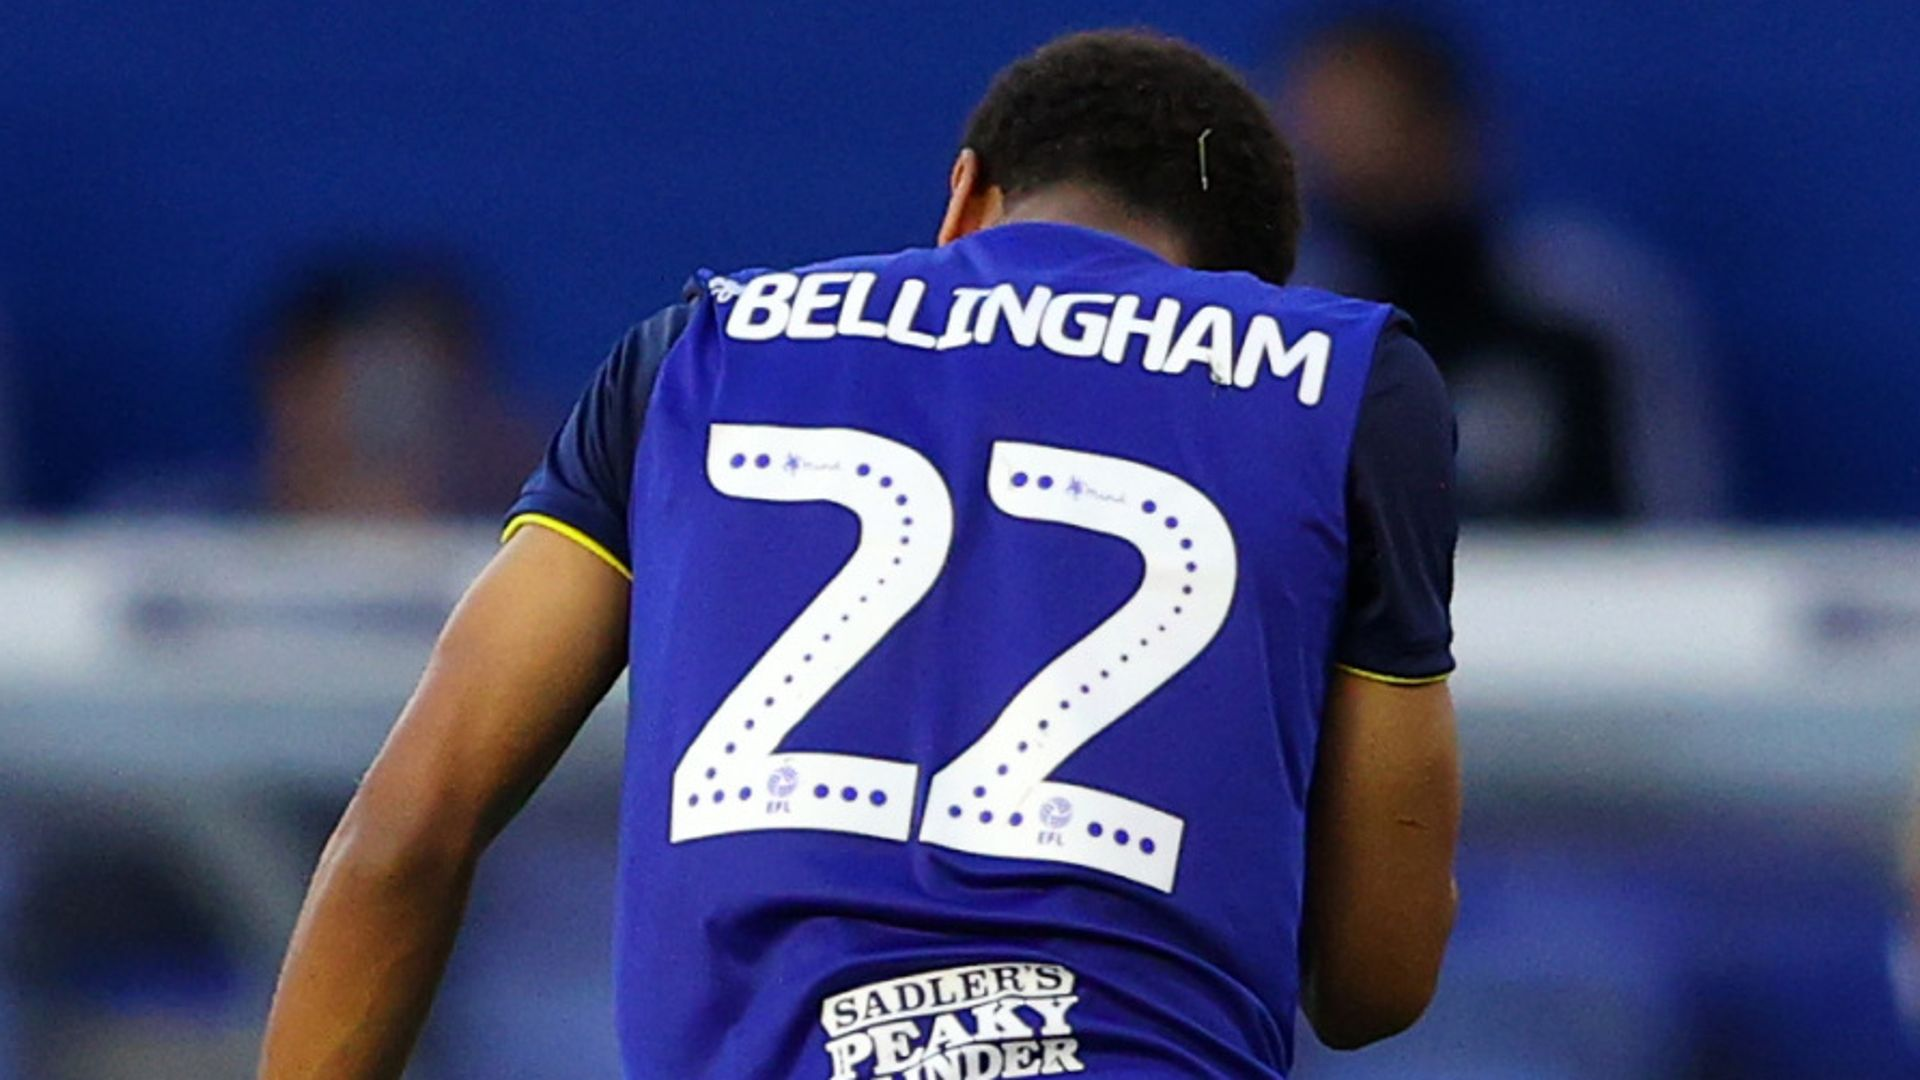 Birmingham retire Bellingham's No 22 shirt